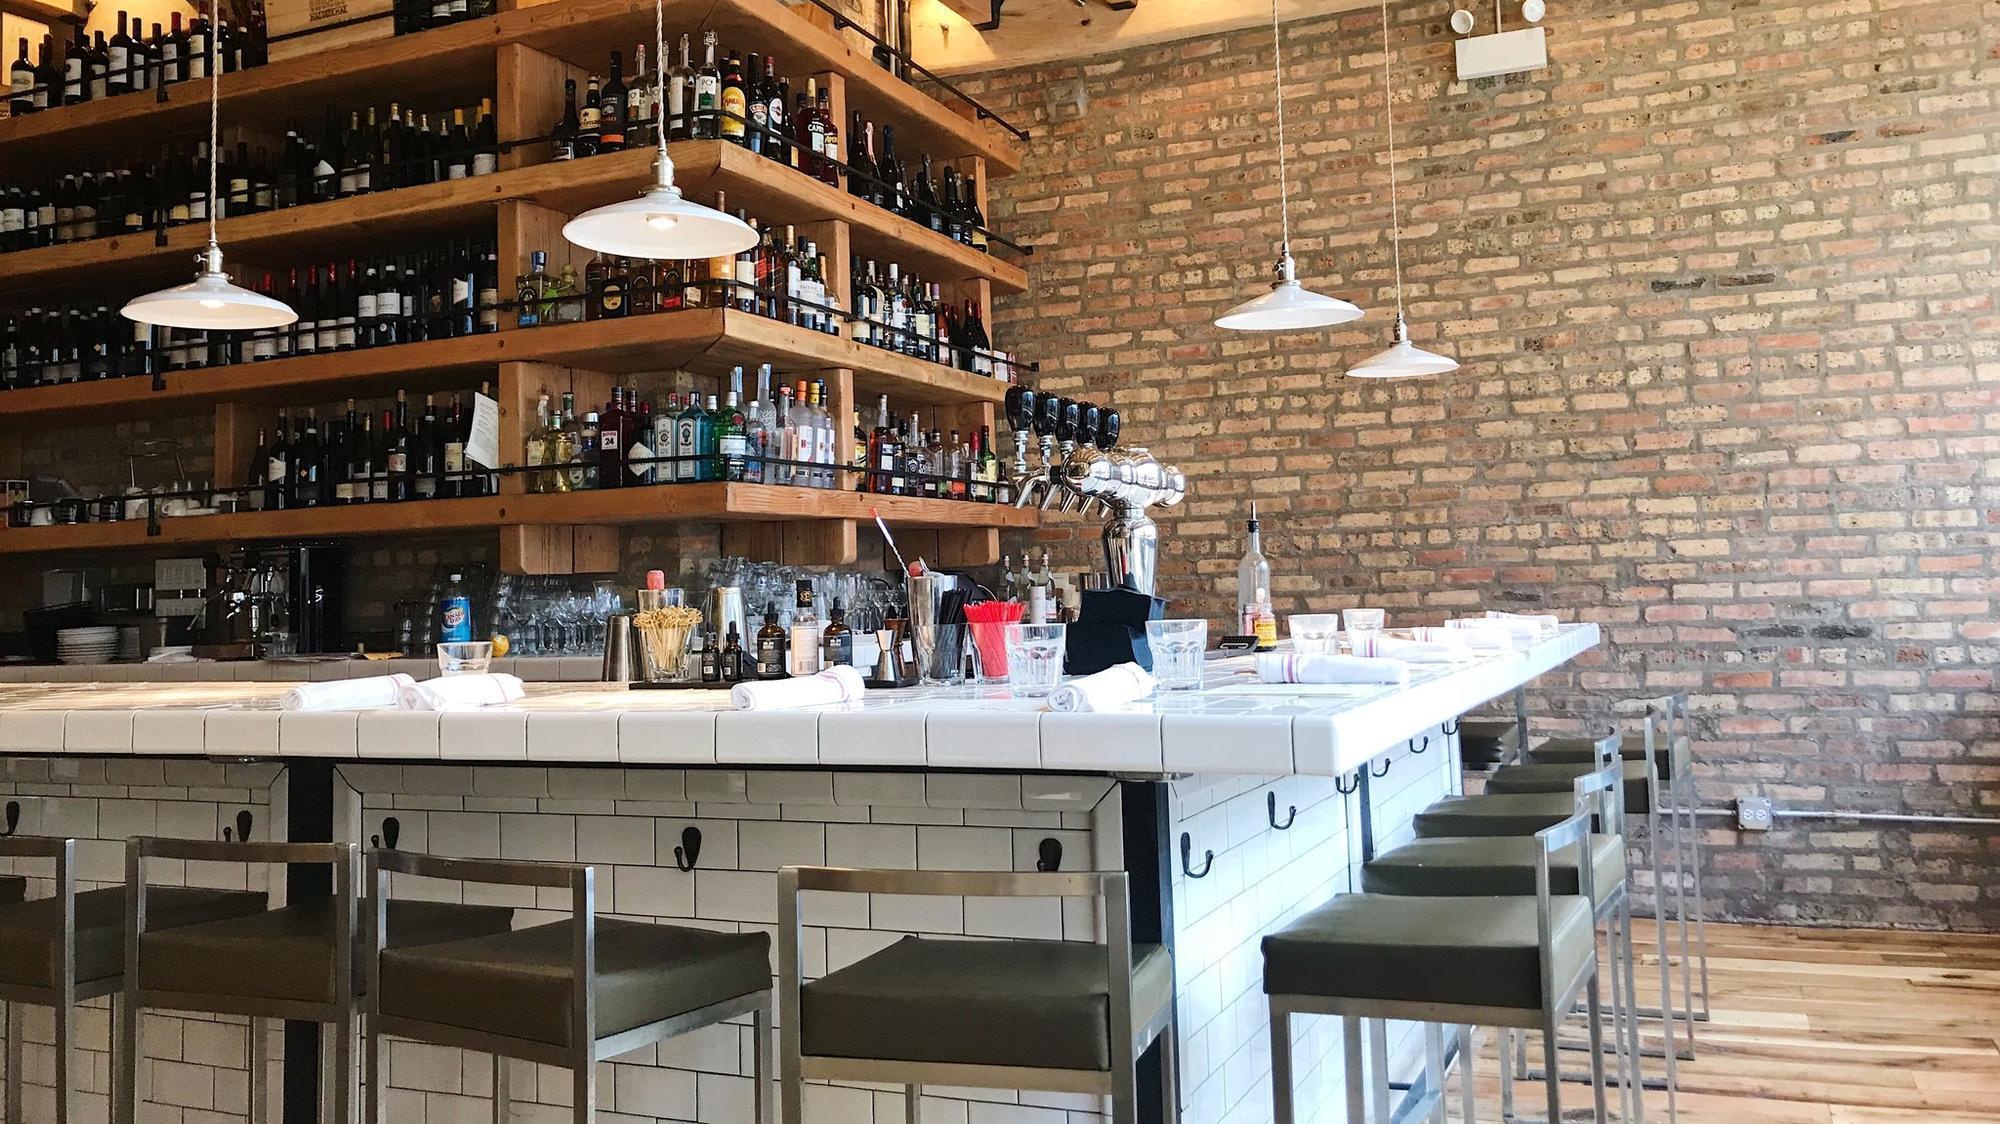 Lakeviewu0027s Lago Wine Bar Sued; Accused Of Copying Menu, Design   Chicago  Tribune